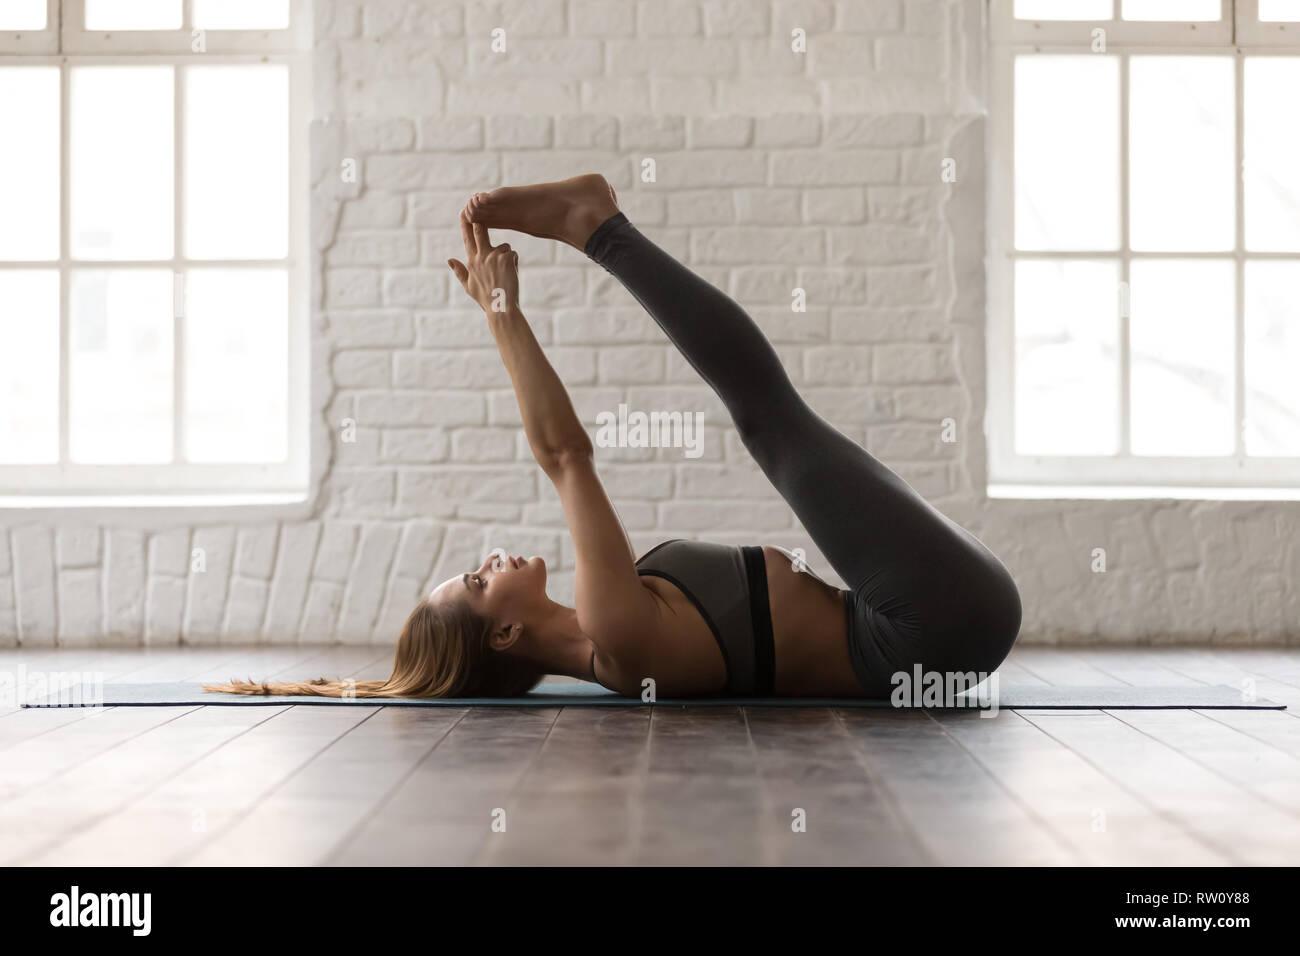 Woman practicing yoga, Double Leg Lift exercise, Urdhva Prasarita Padasana - Stock Image